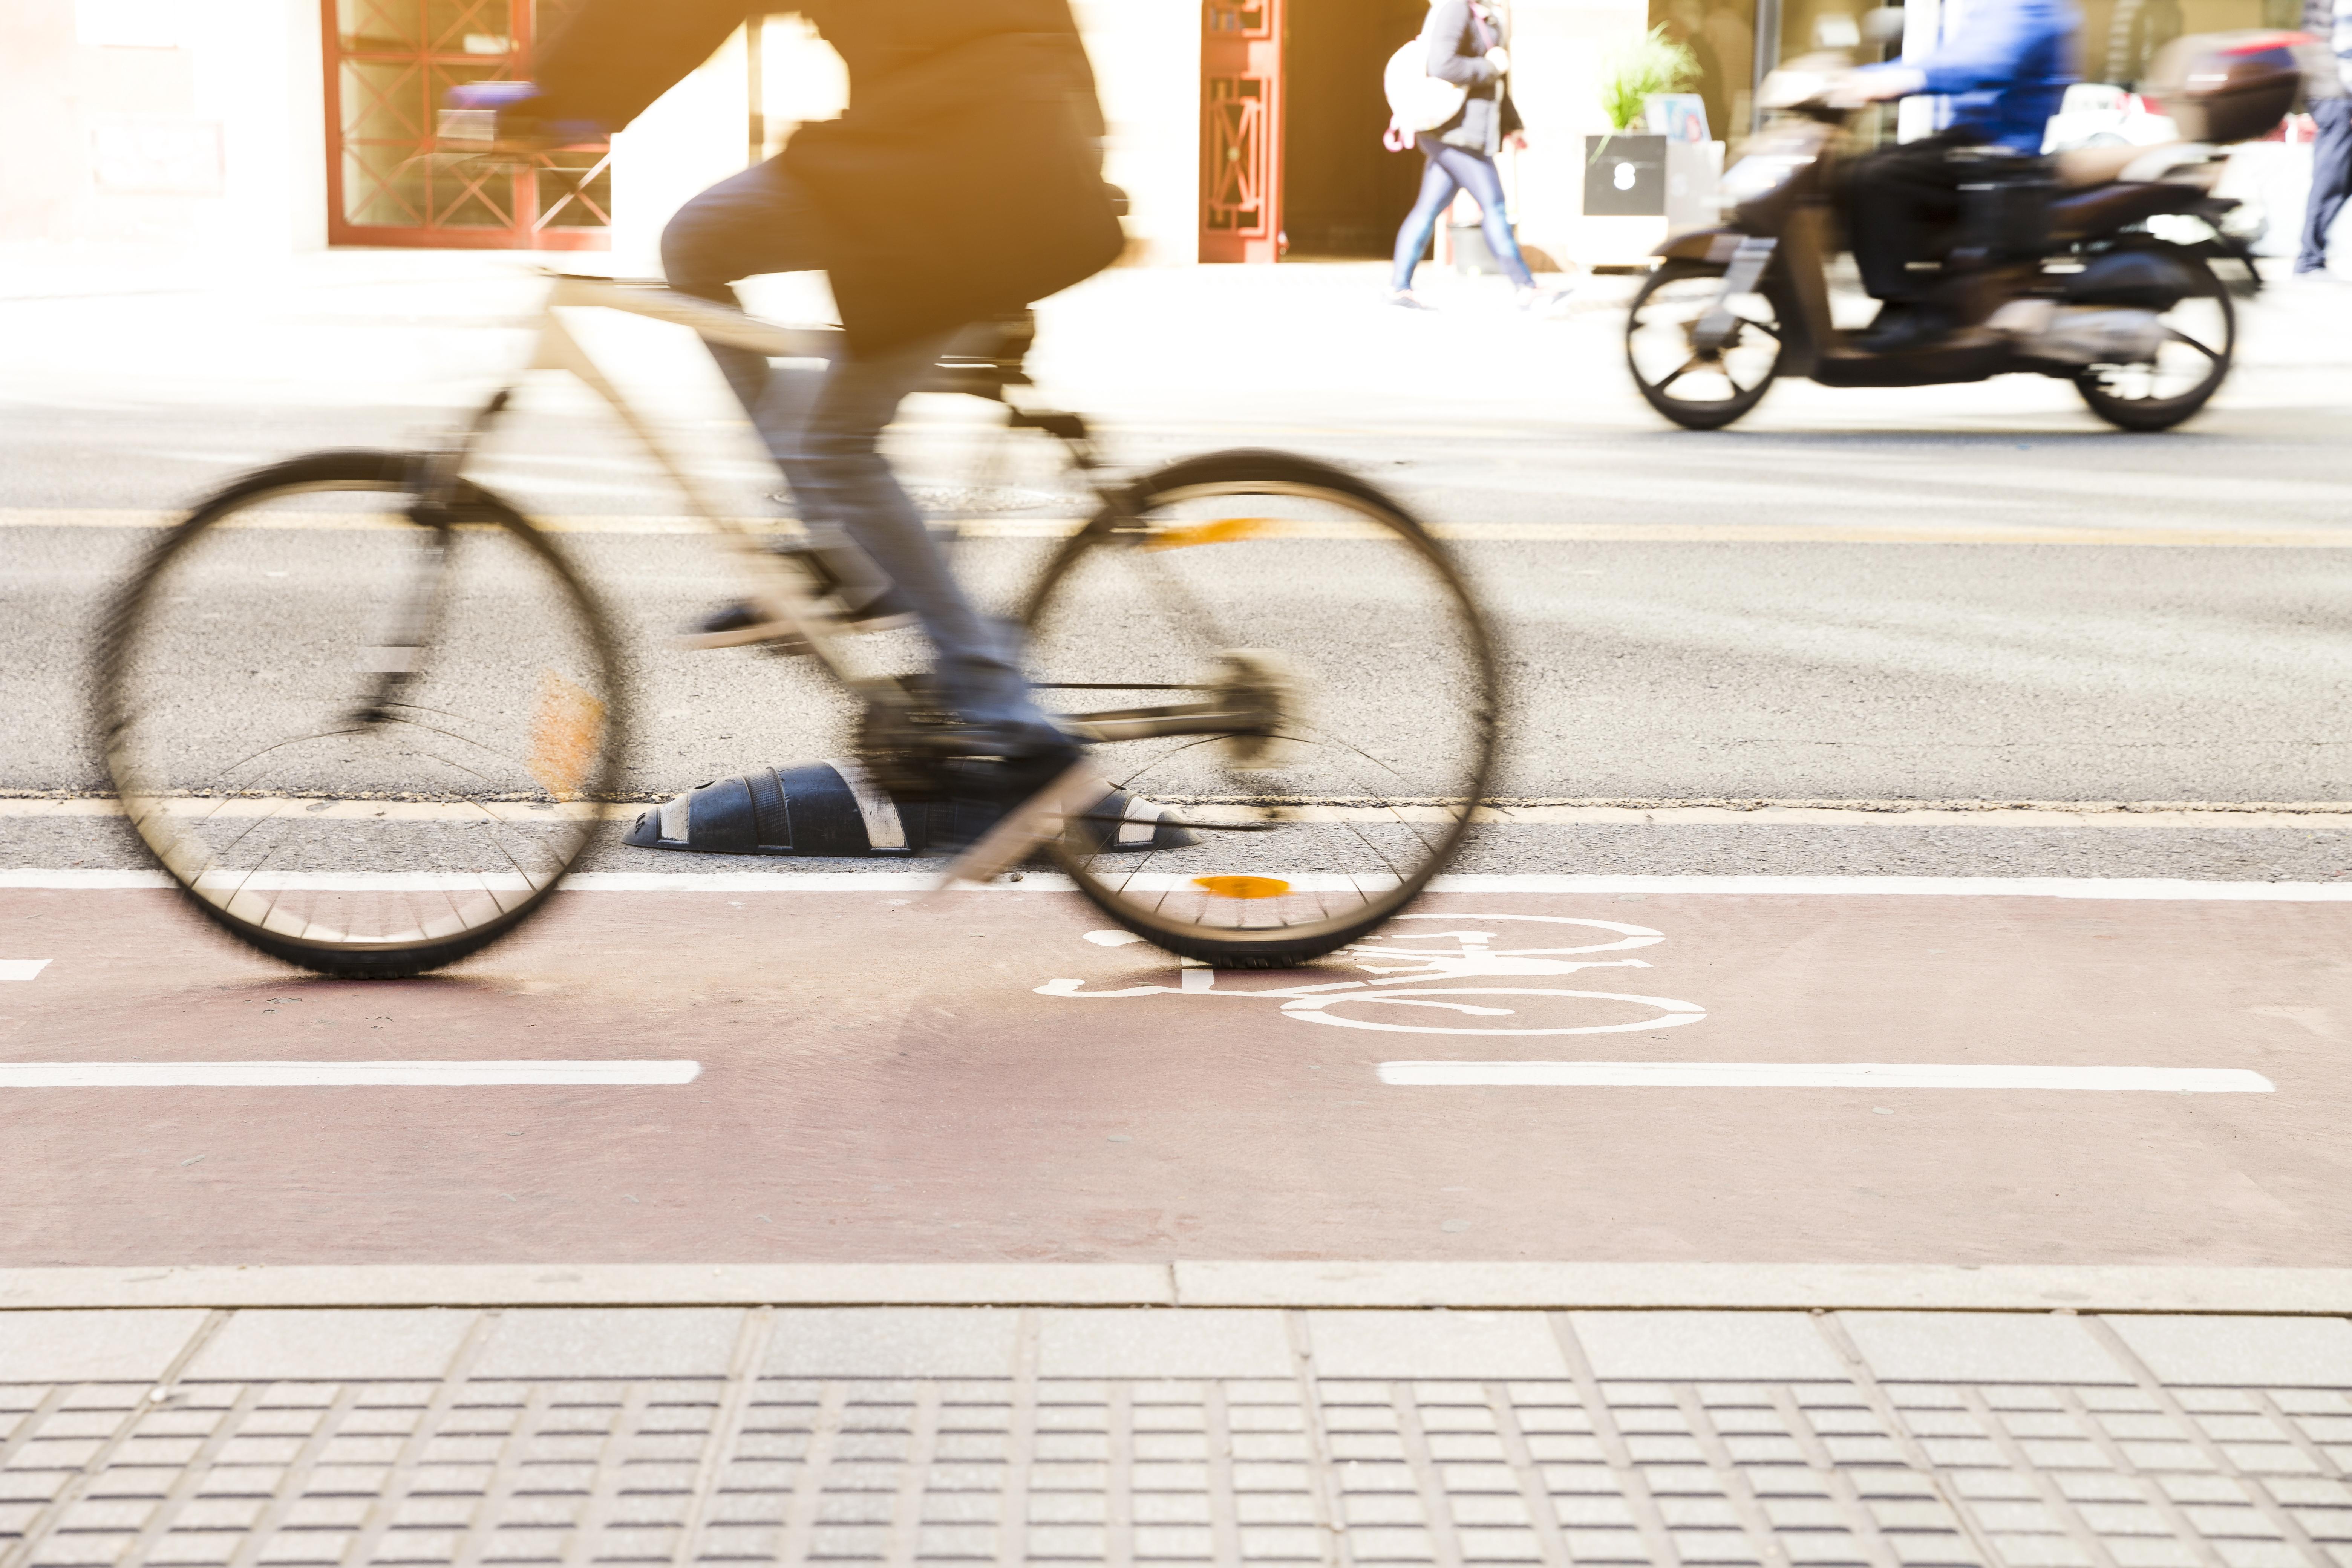 unrecognizable-cyclist-riding-bike-bicycle-lane-through-city-street.jpg